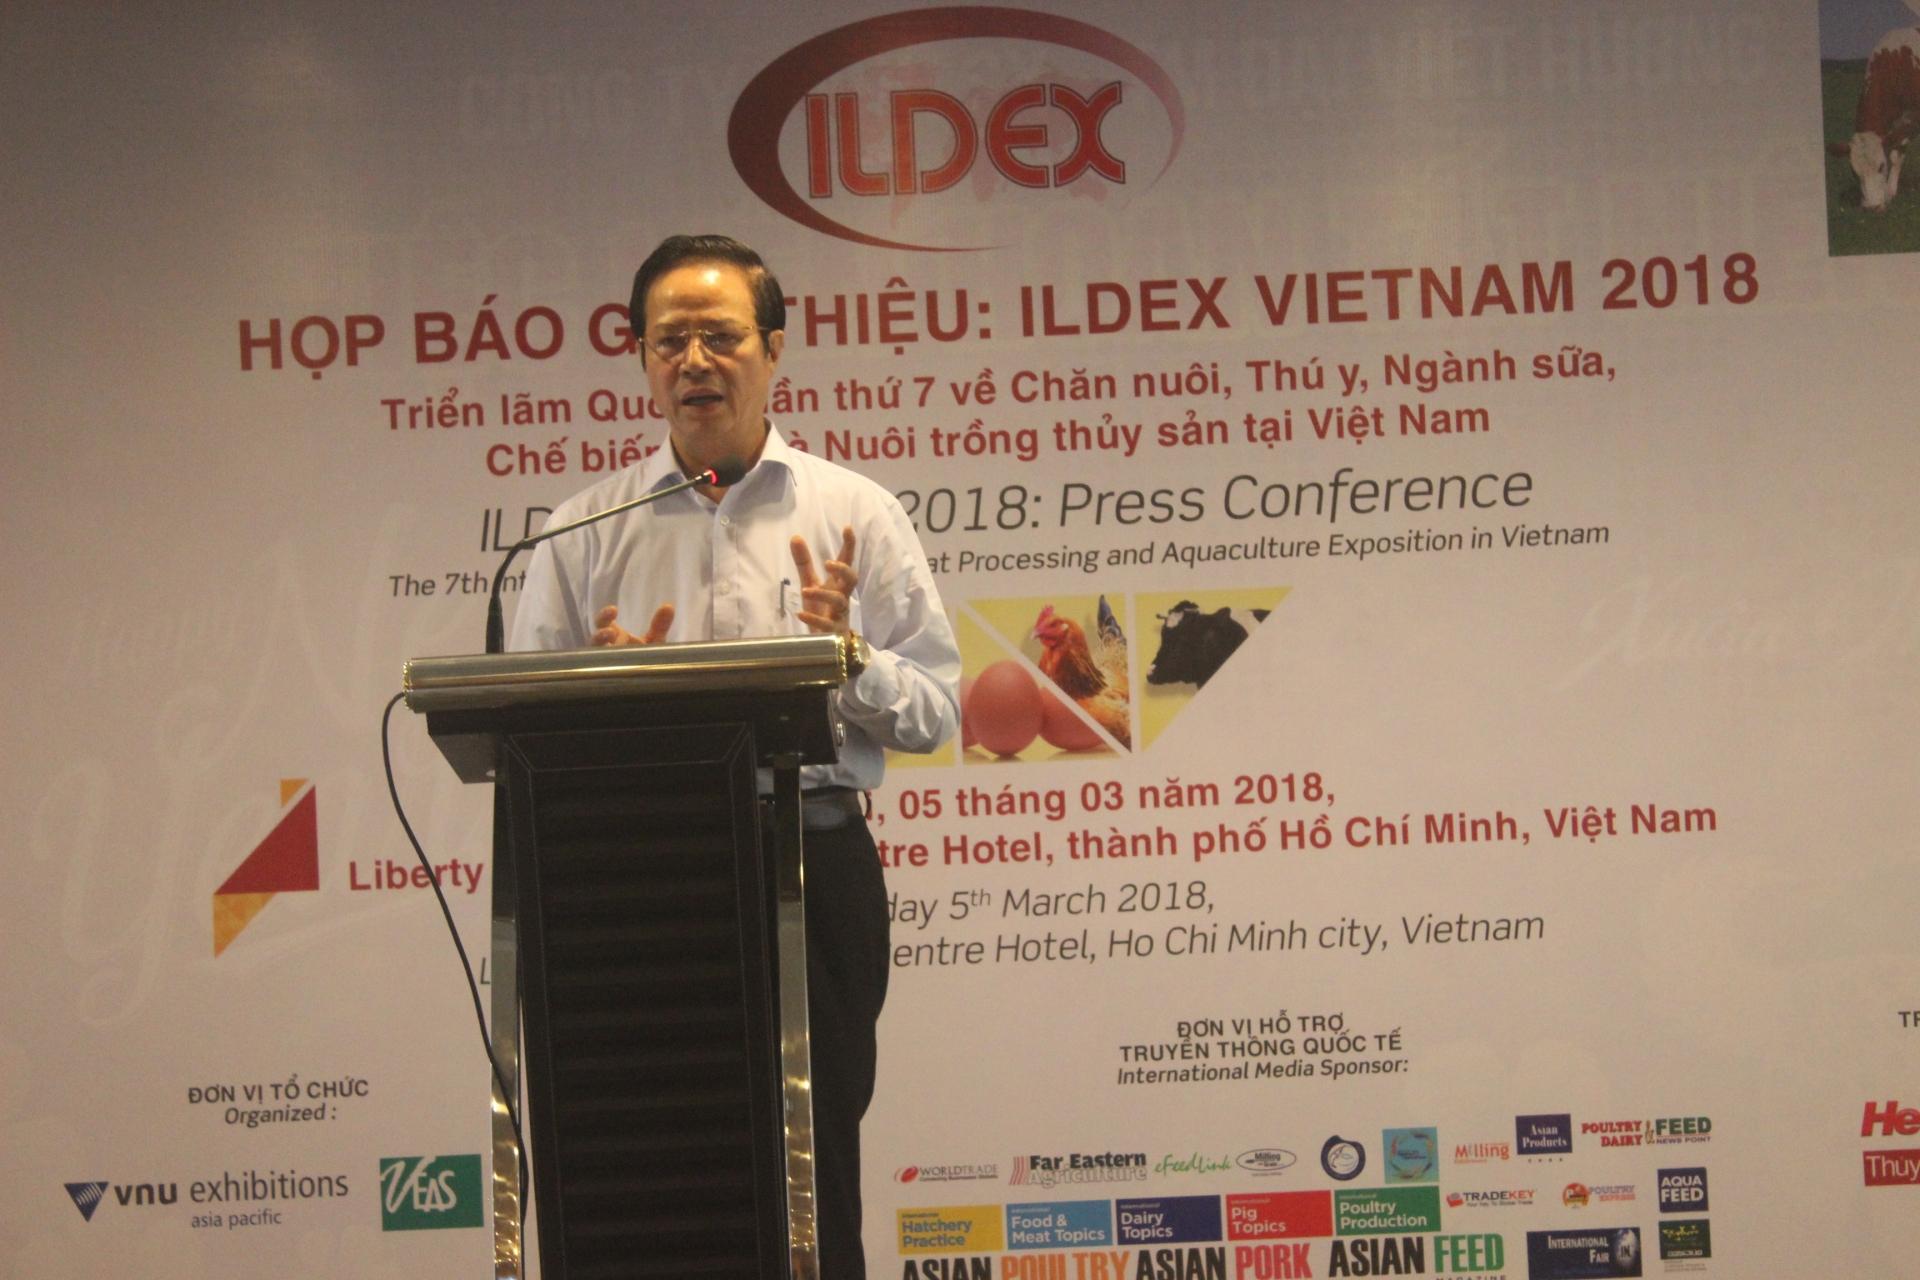 over 280 companies will join ildex vietnam 2018